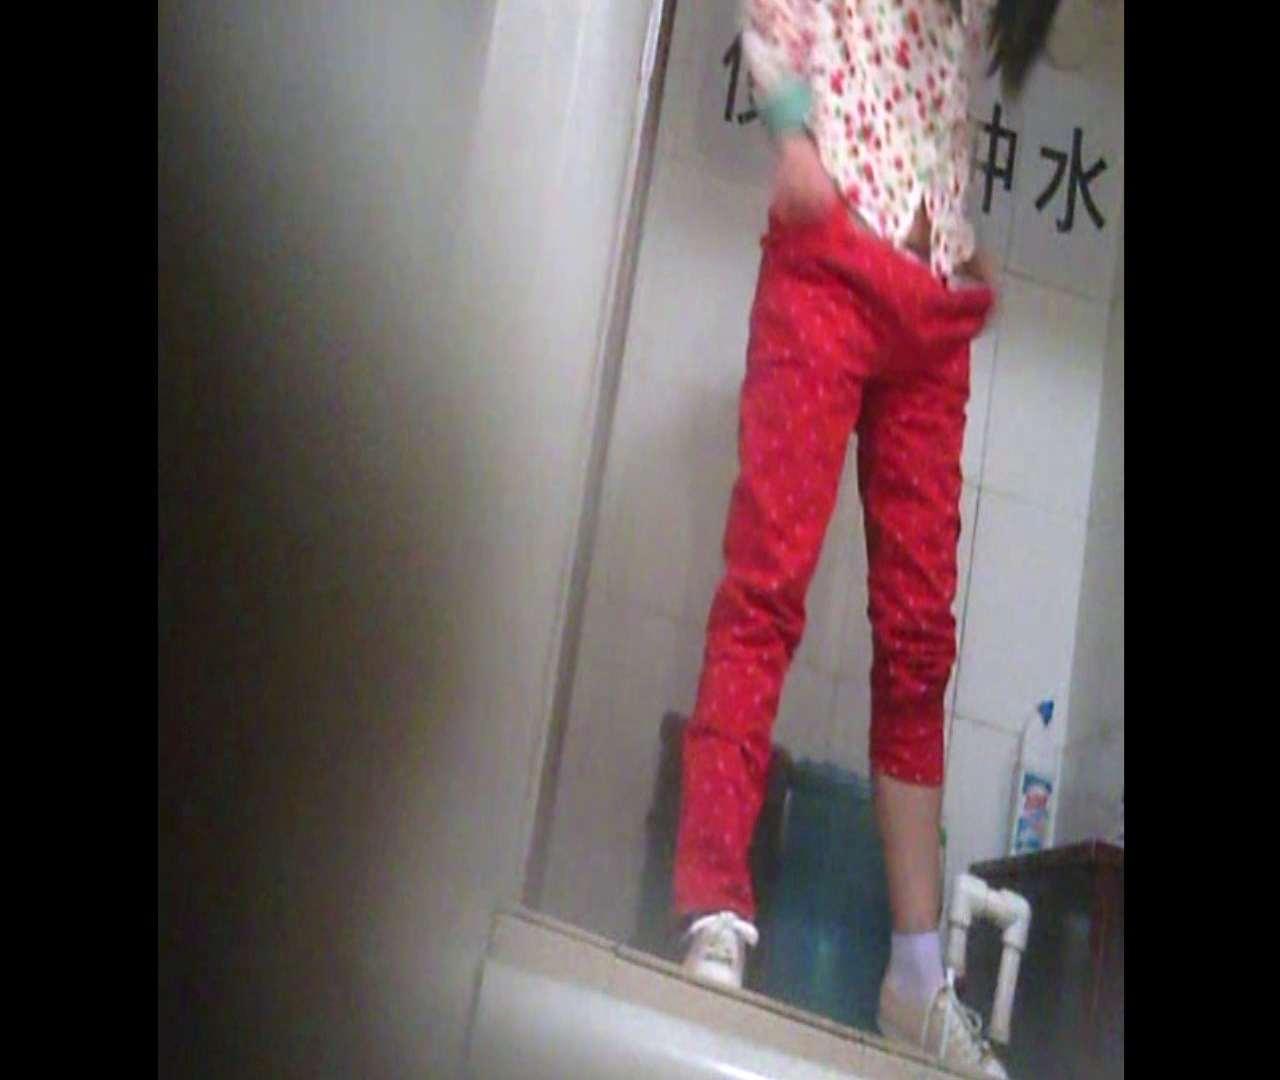 Vol.01 赤のパンツスタイルがとっても眩しい!! パンツ特集 AV無料動画キャプチャ 61画像 59